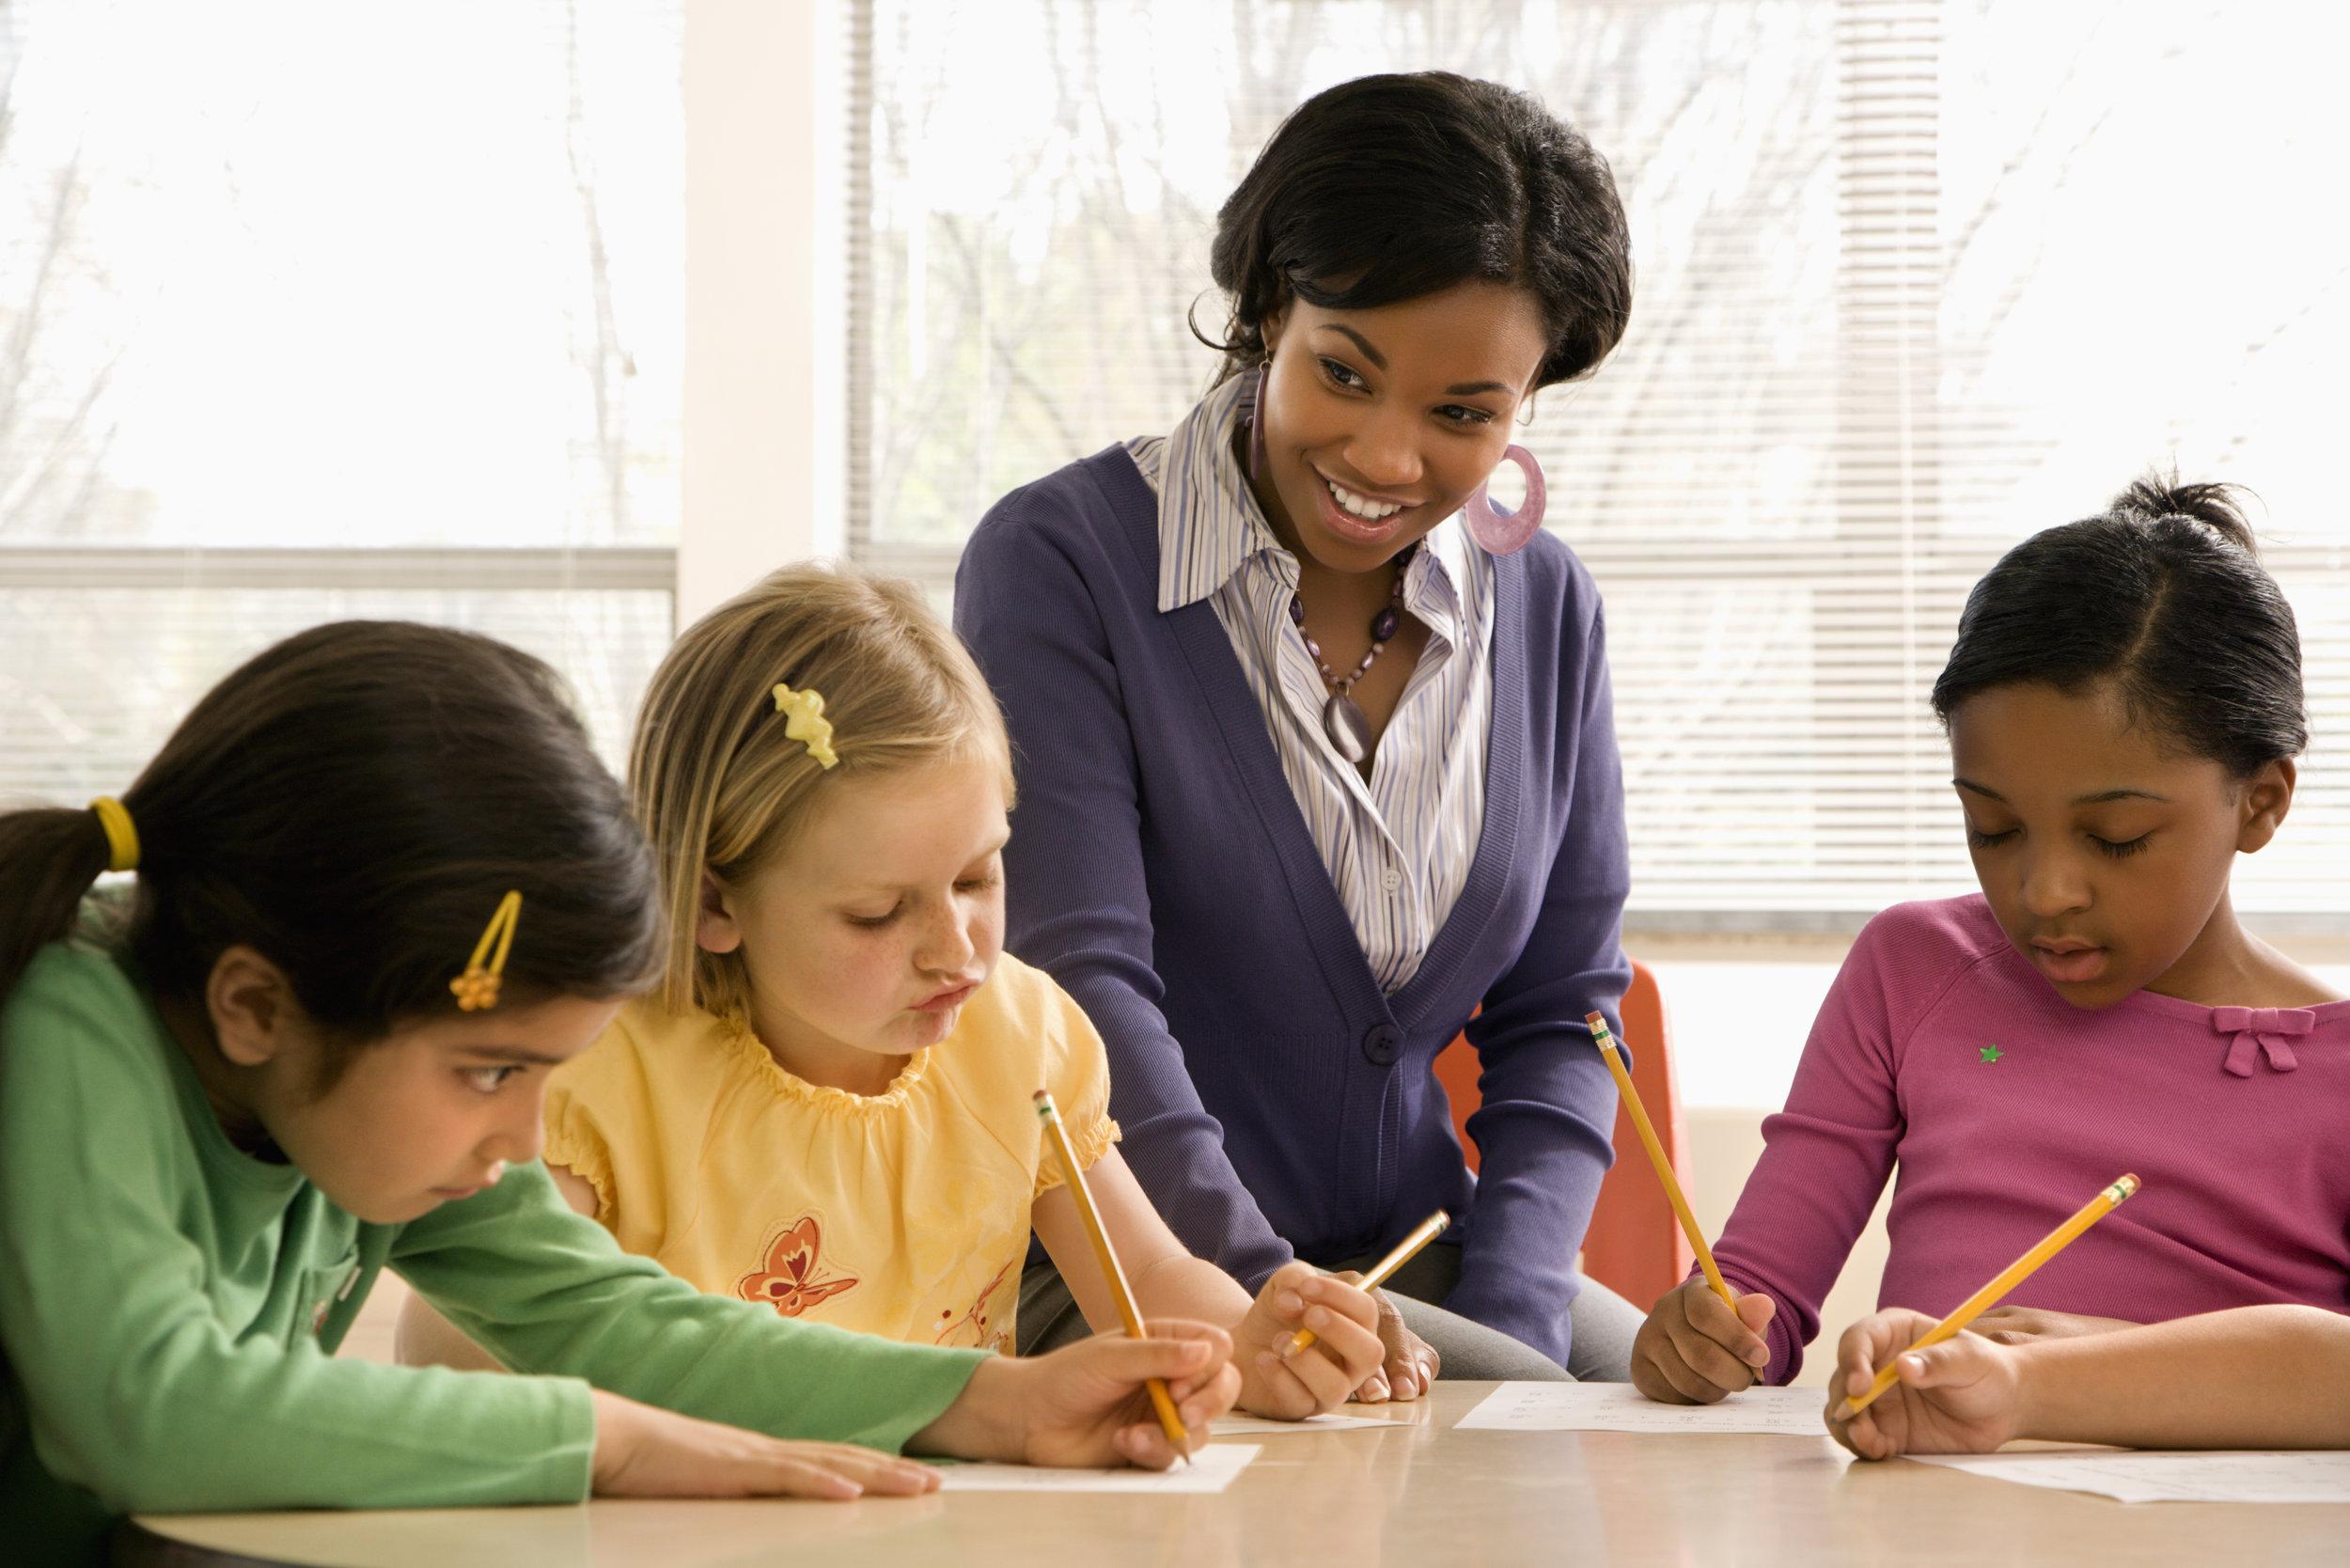 bigstock-Teacher-Helping-Students-6741161.jpg